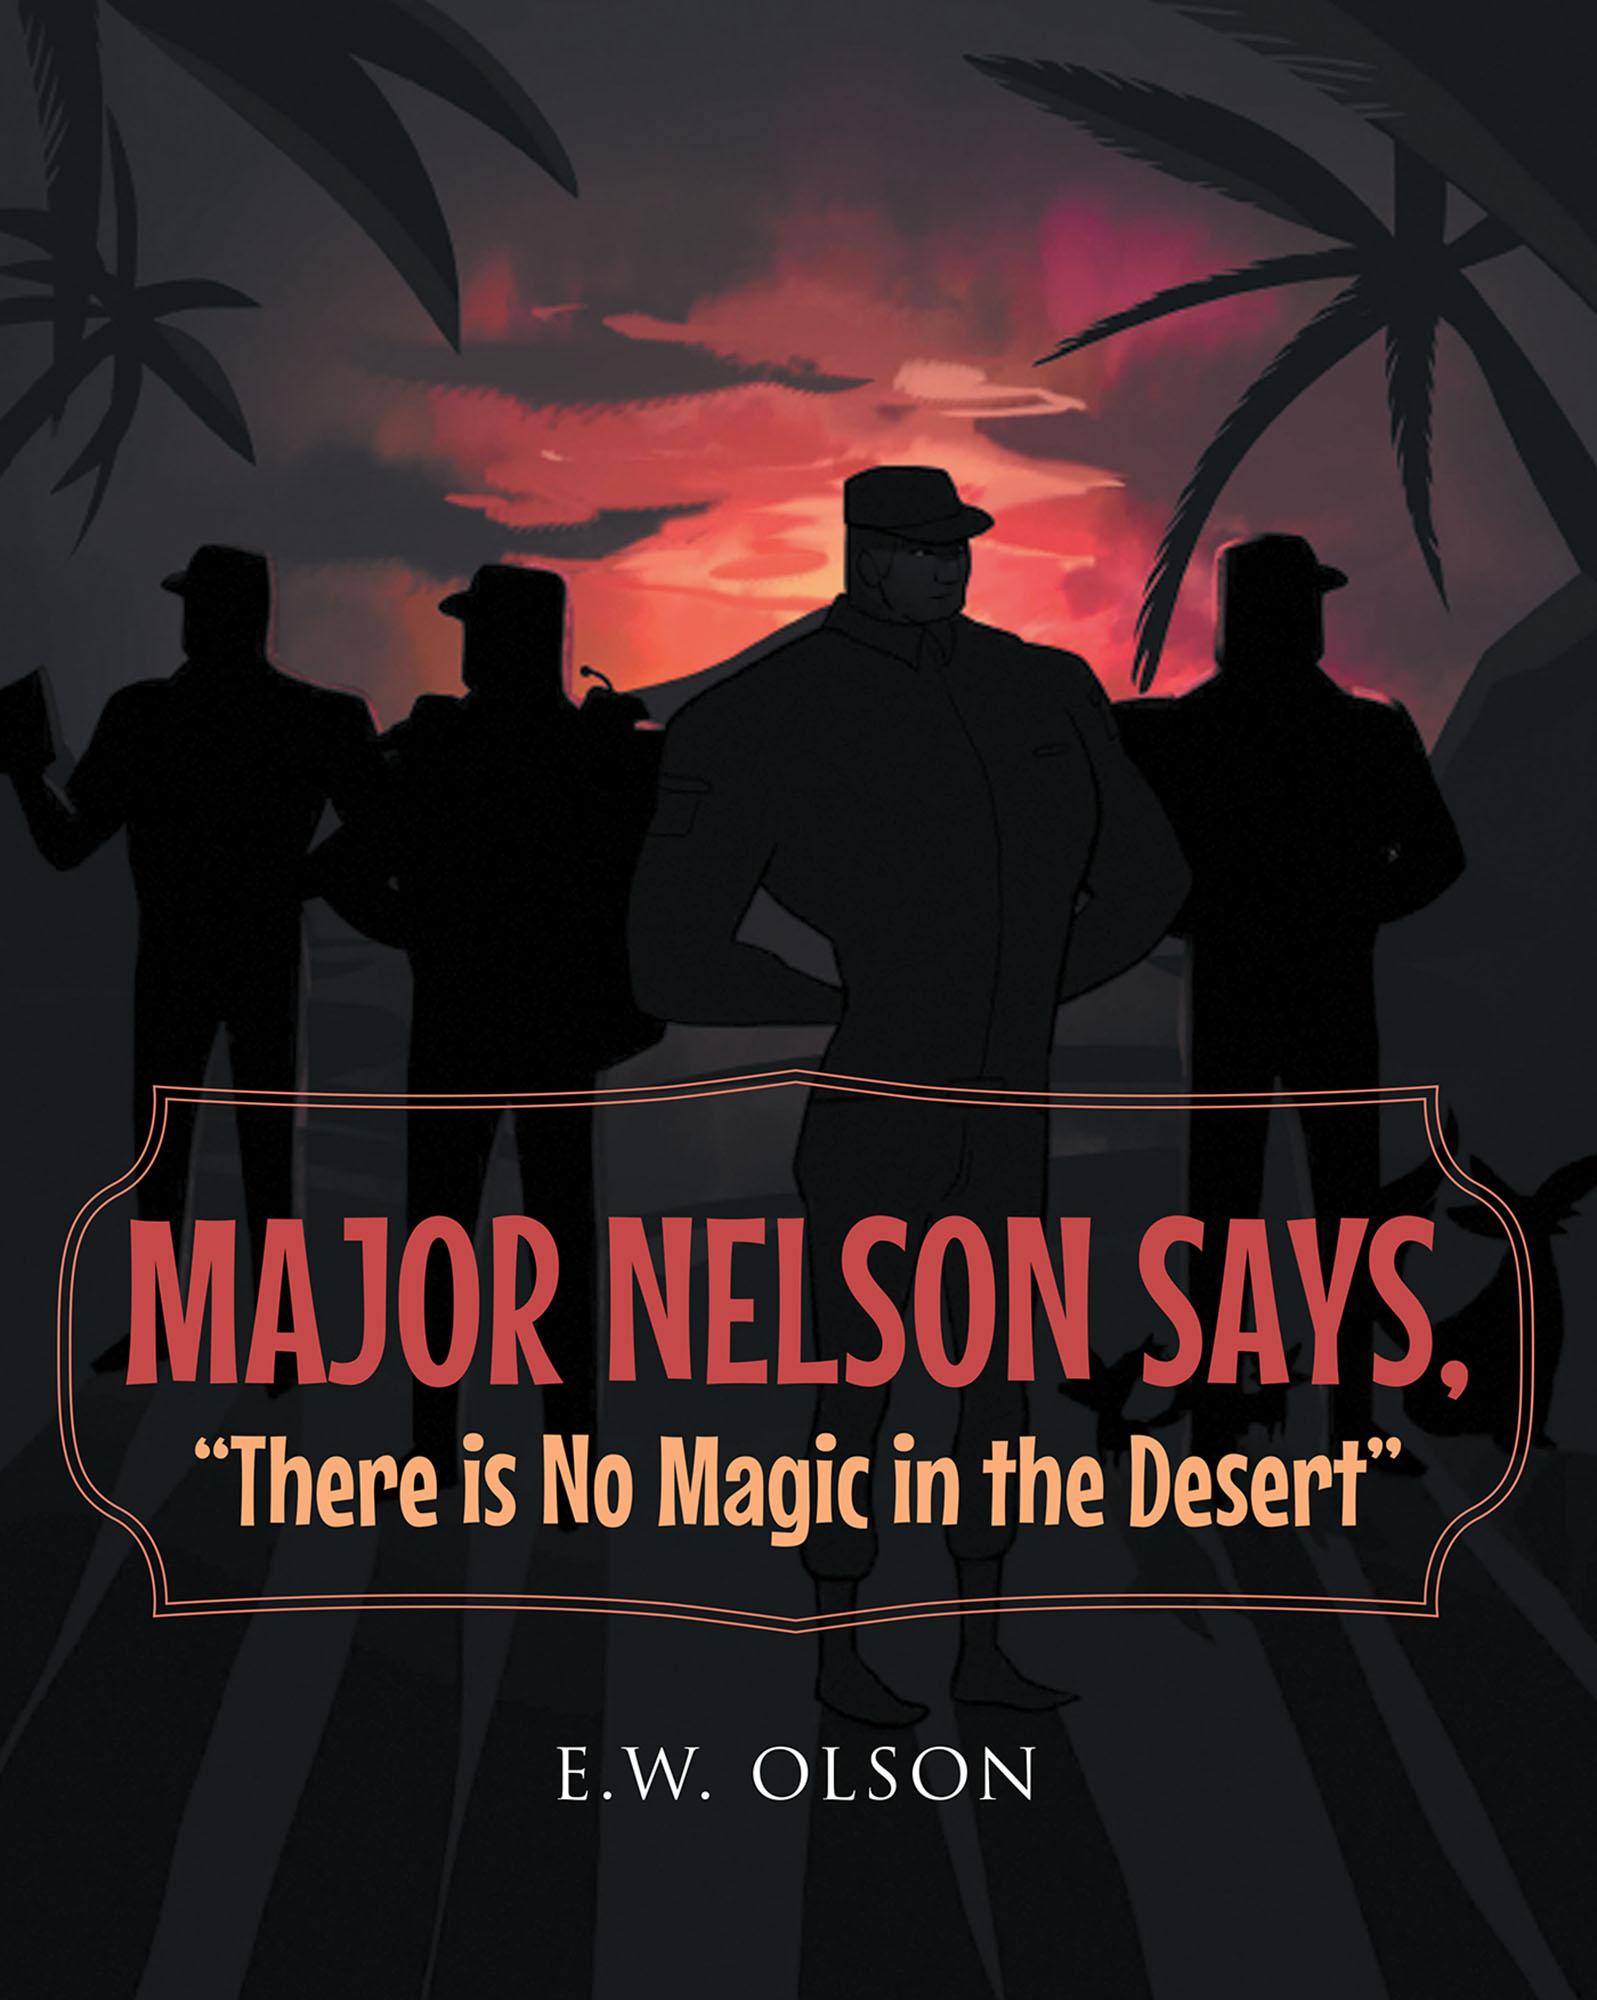 Major Nelson Says,